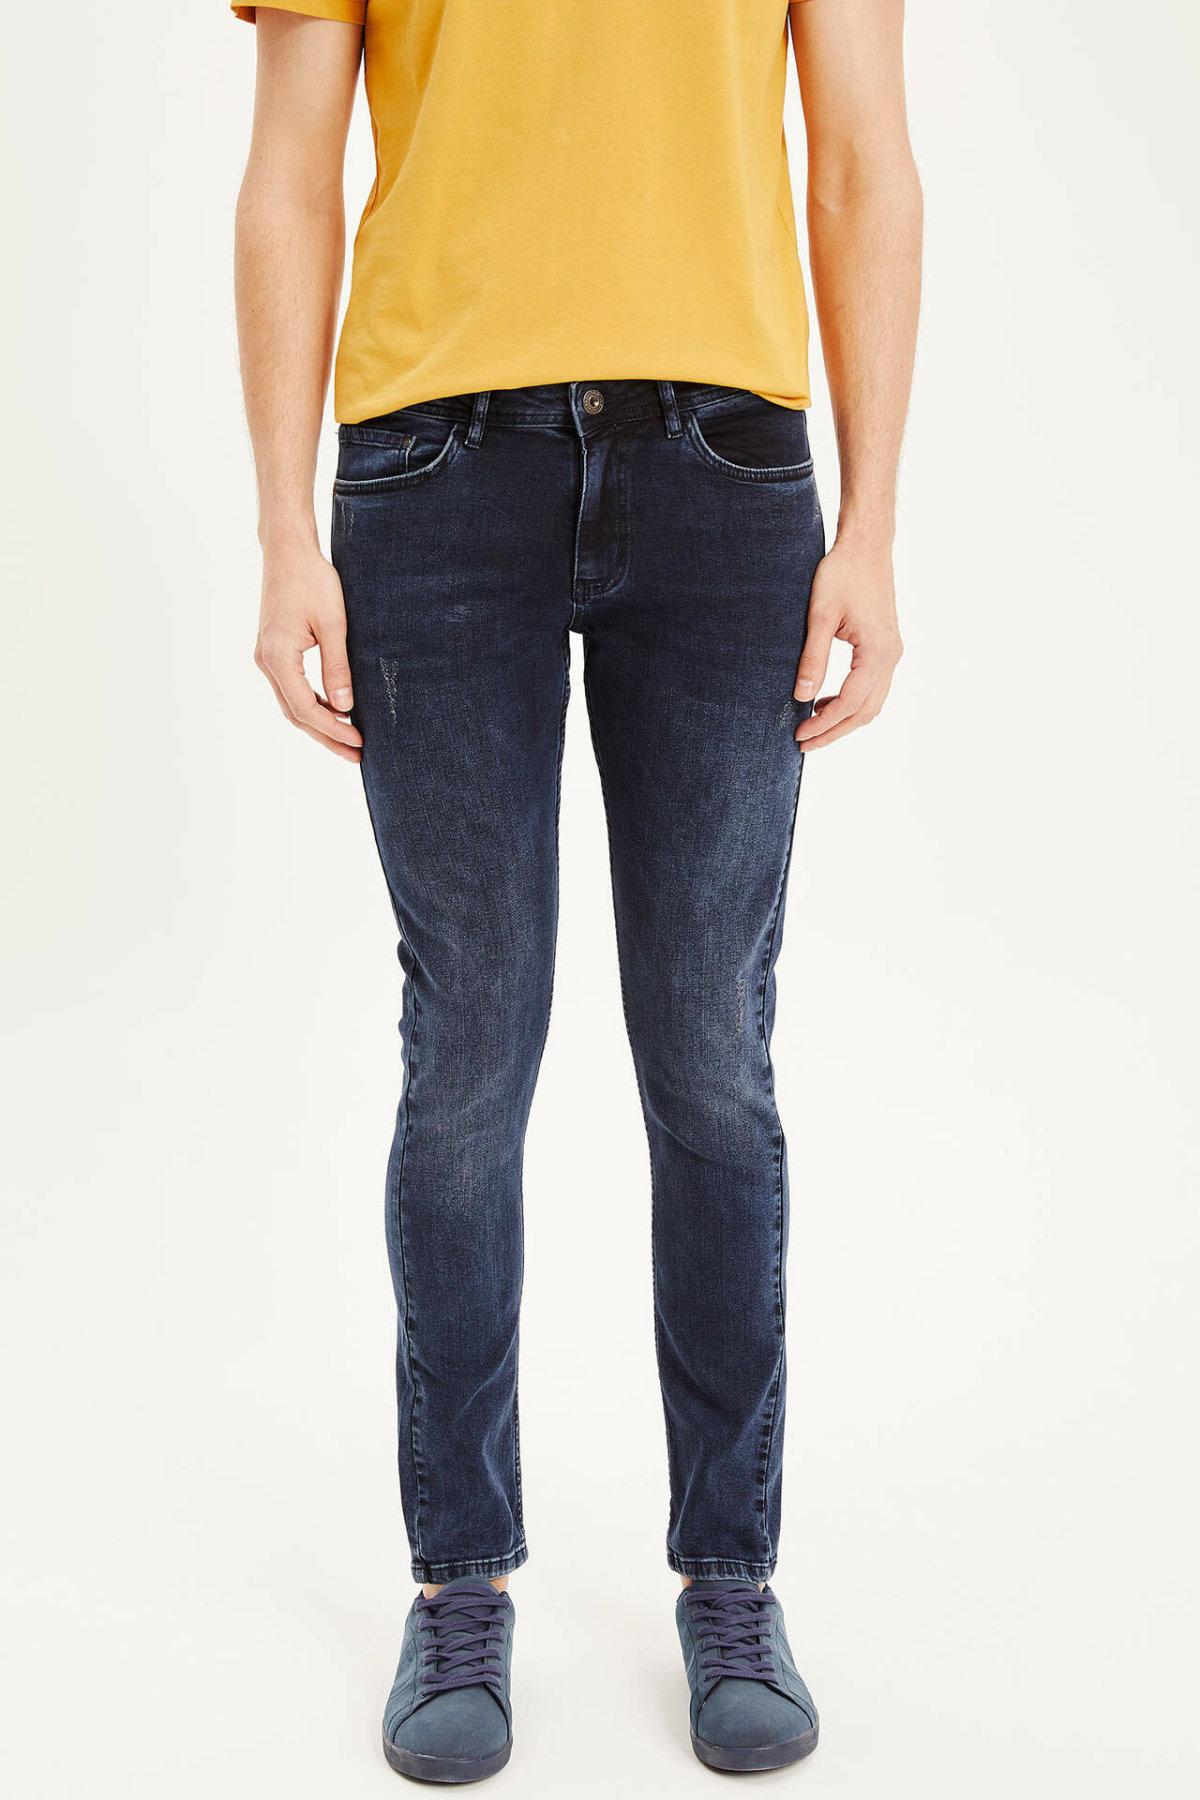 DeFacto Man Trousers-K4117AZ19SP